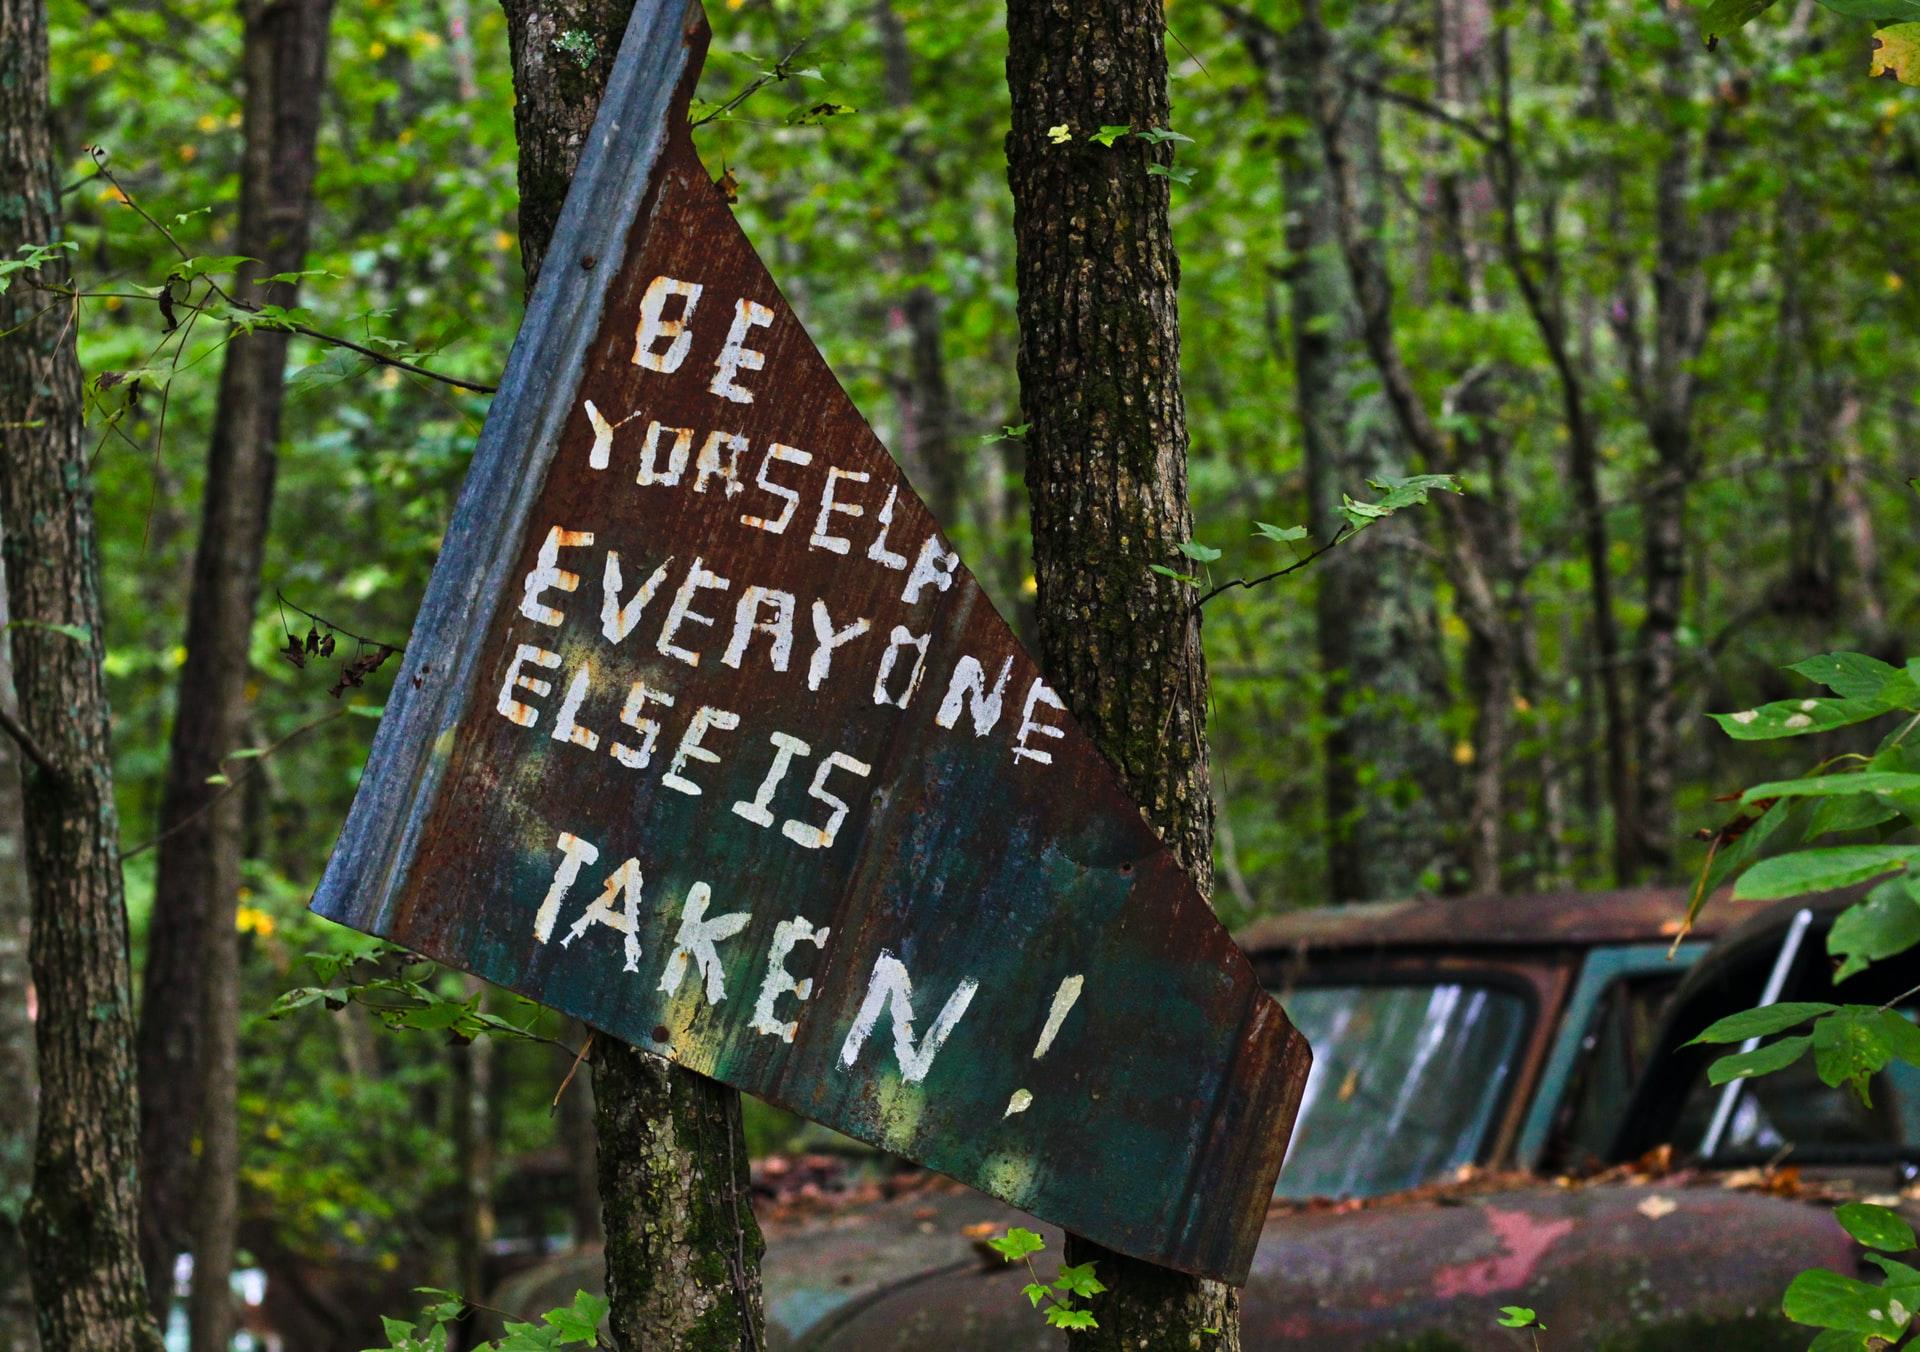 healthy self-esteem Durham, NC 27707